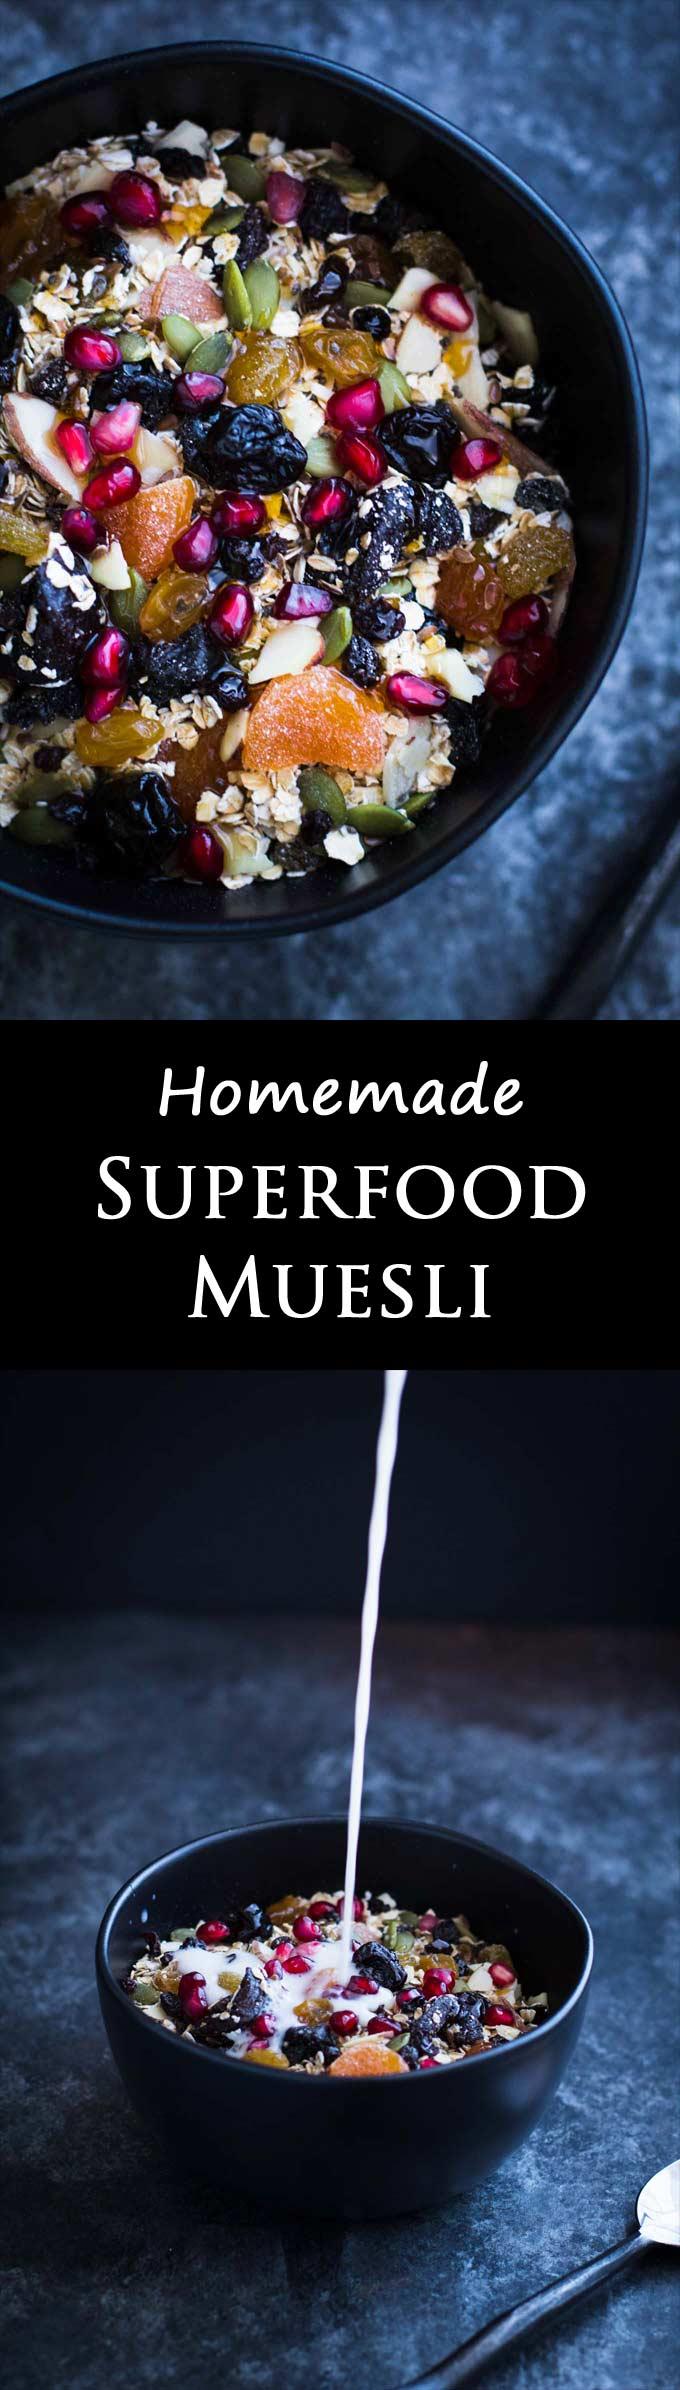 Homemade Muesli | Healthy Superfood | Breakfast | Gluten-free | Vegan | Vegetarian | Quick and Easy